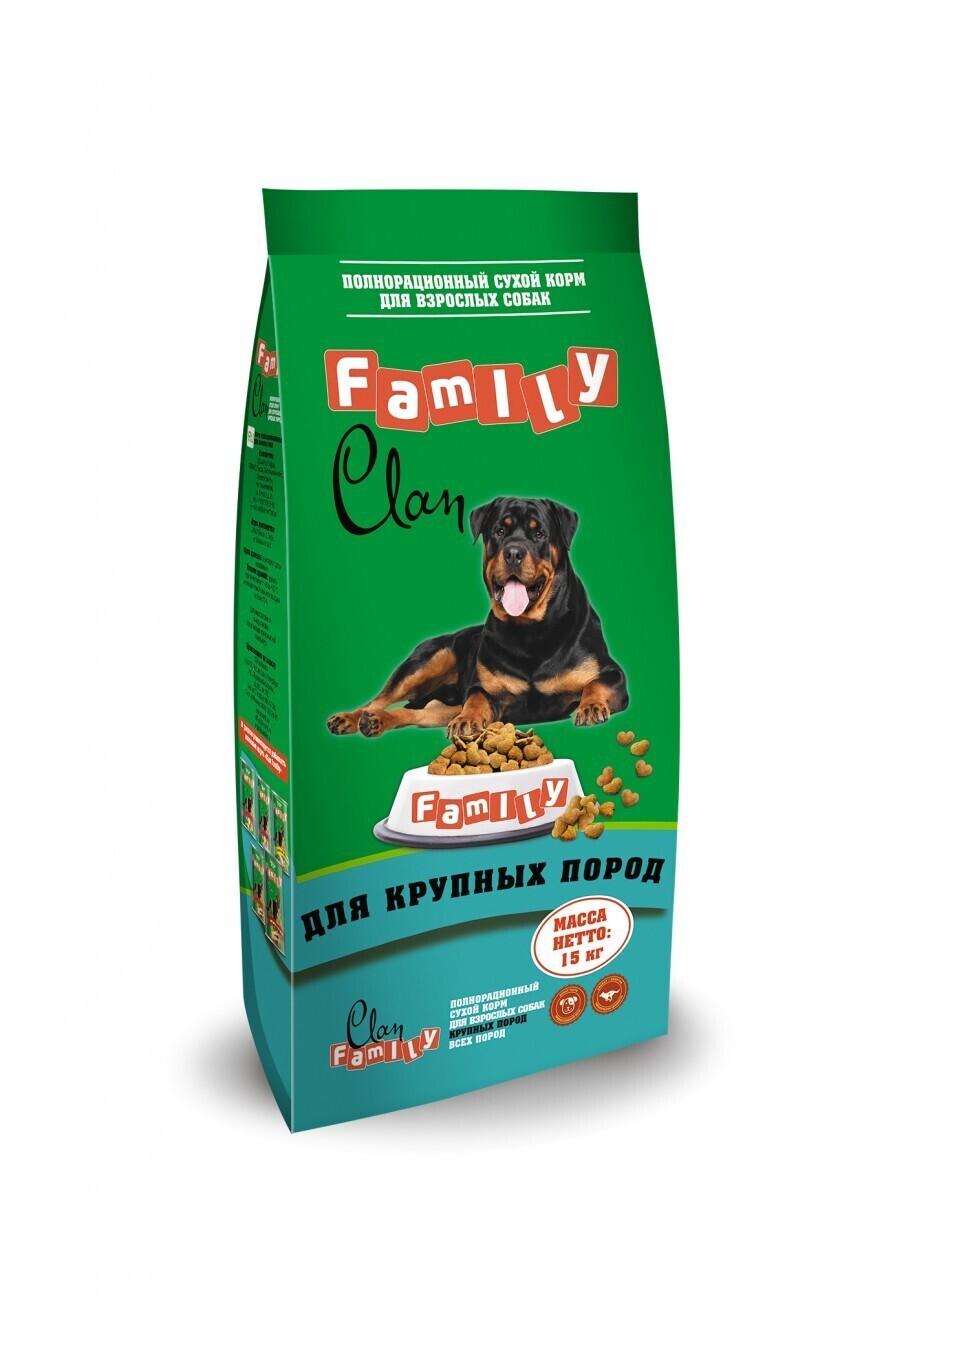 Clan Family корм для взрослых собак крупных пород, птица 15 кг